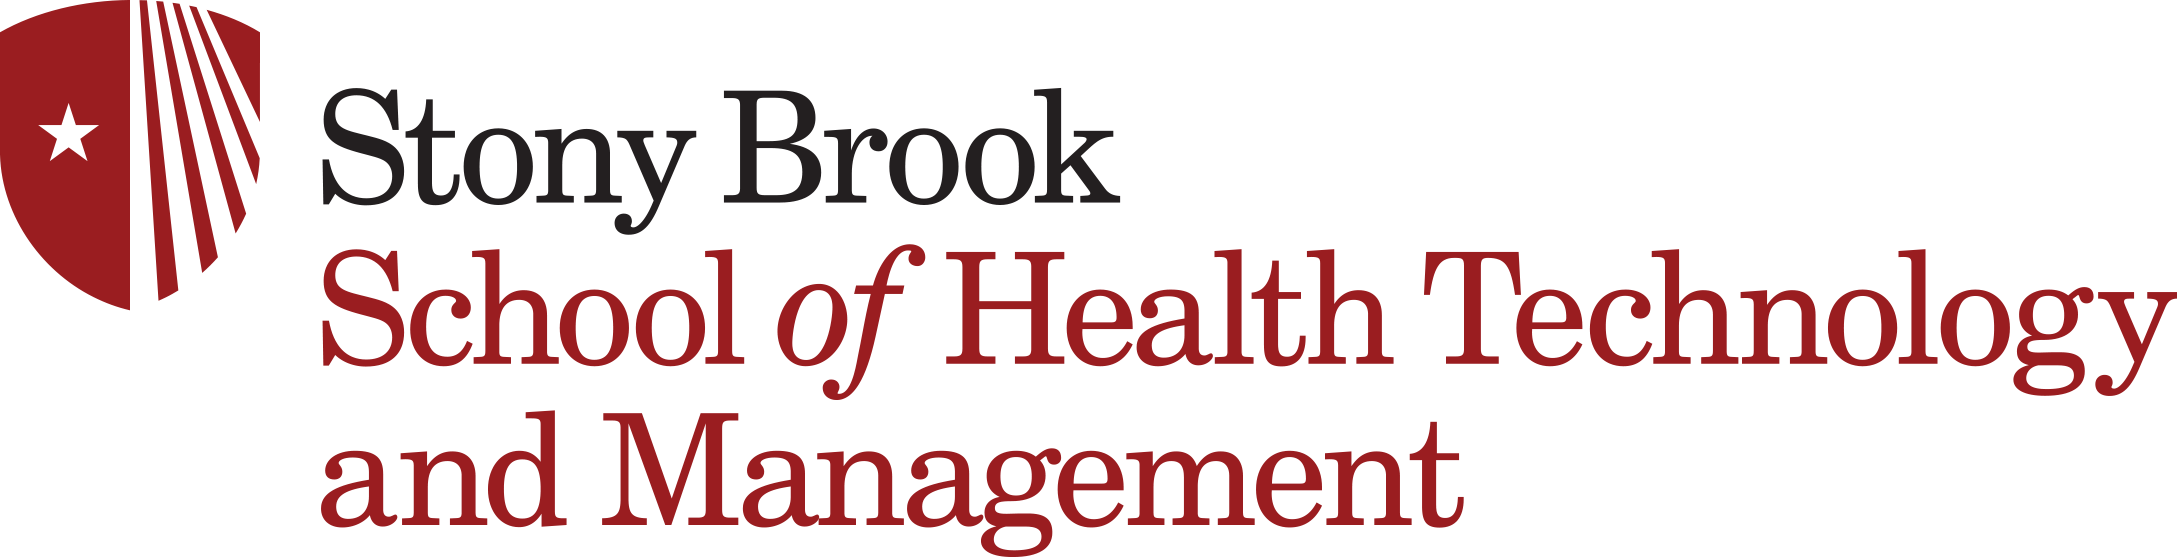 Sbu Academic Calendar.Academic Events Calendars School Of Health Technology Management